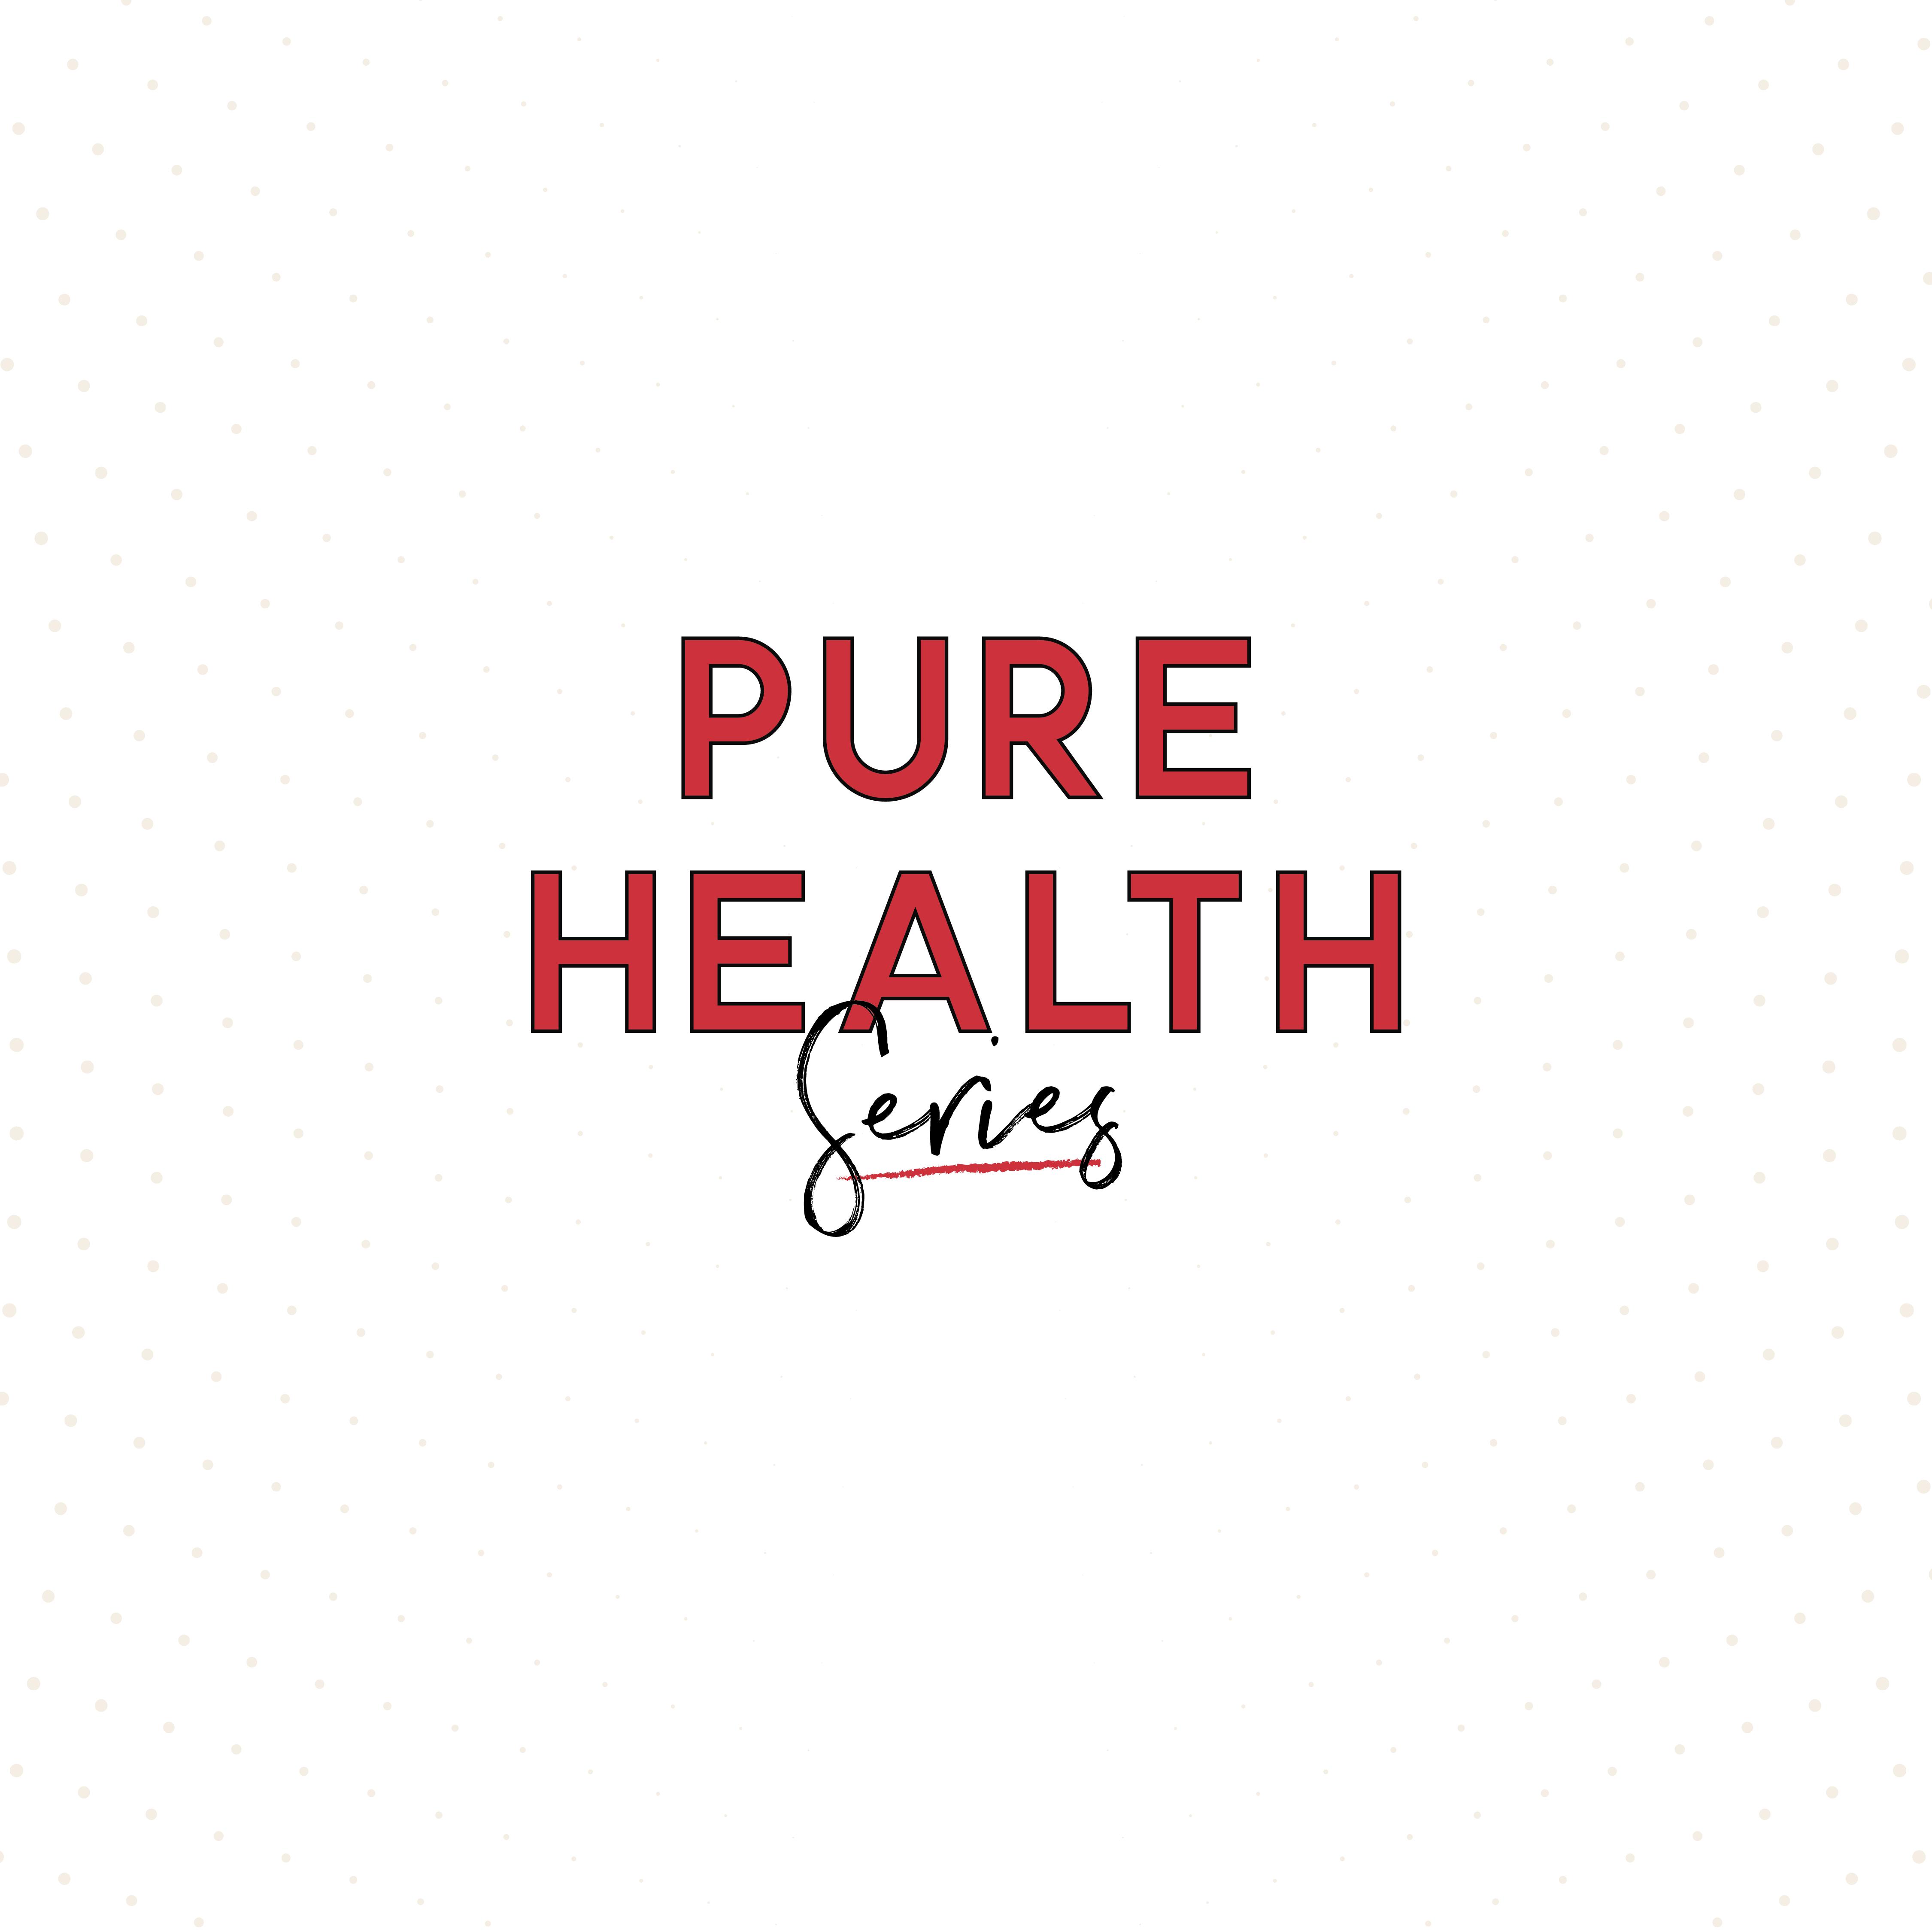 Pure Health Series_1080x1080 v.1